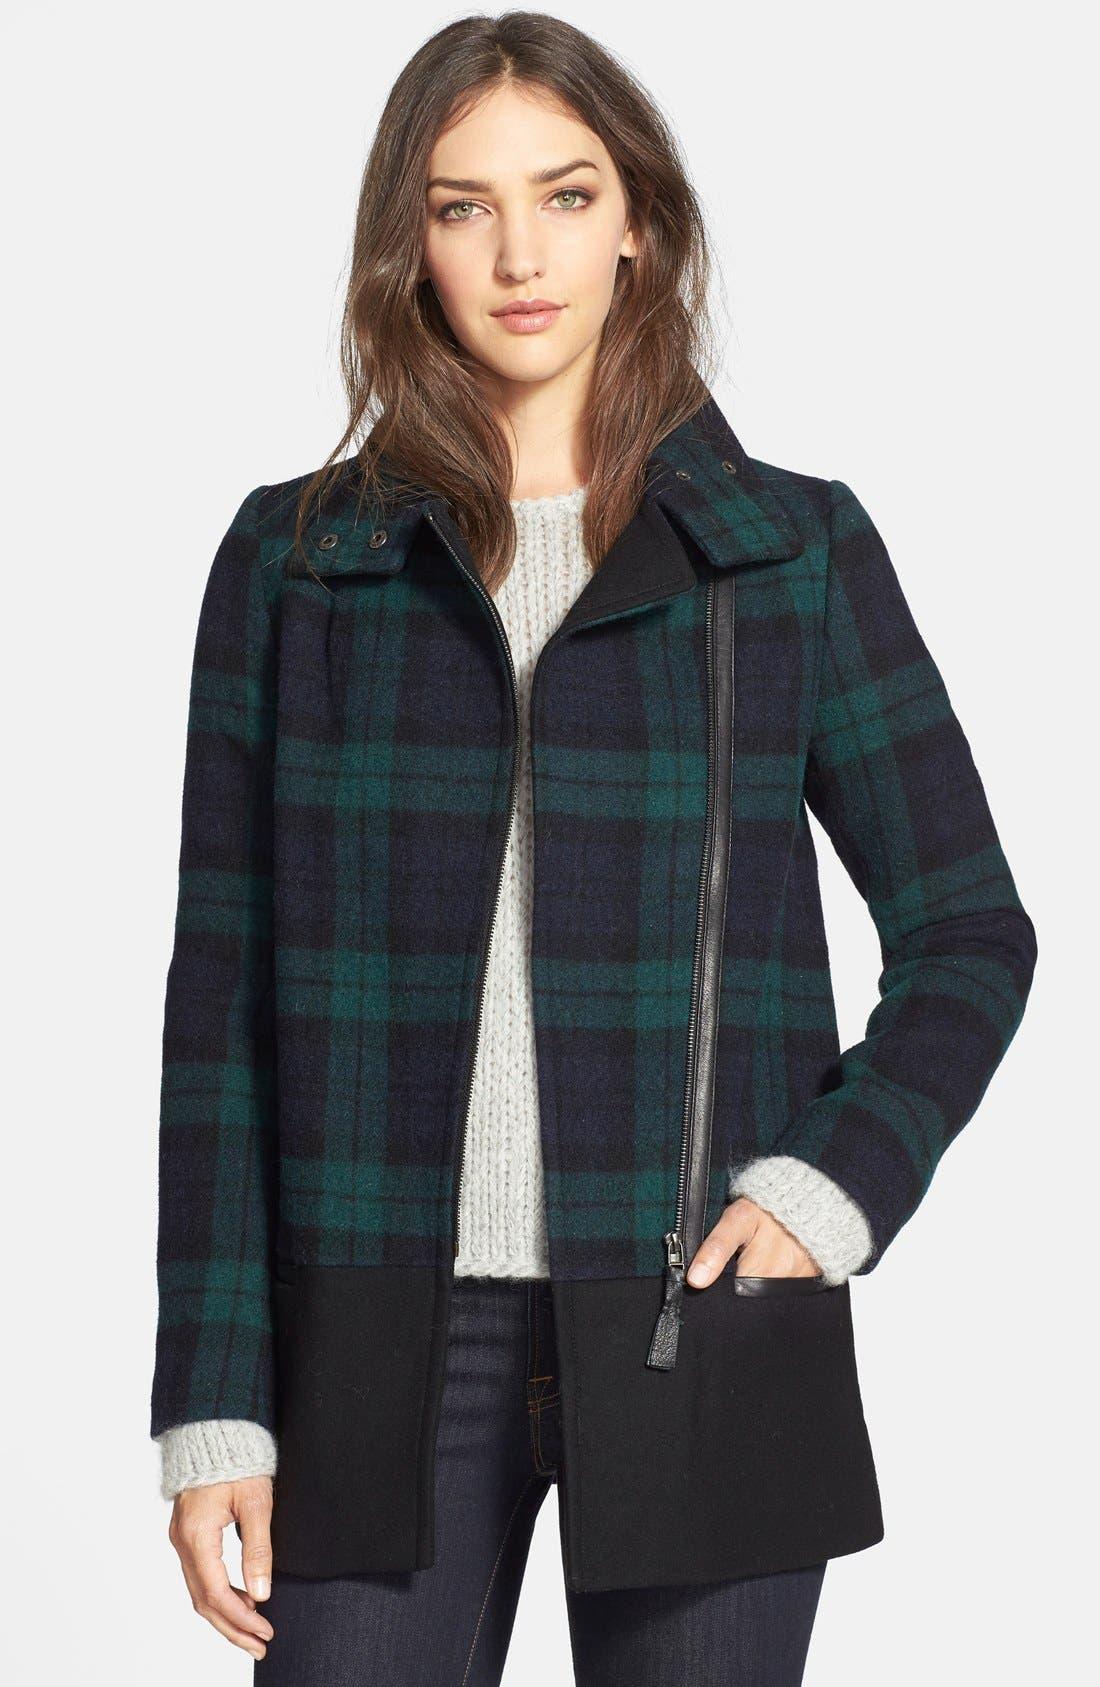 Main Image - Mackage 'Berta' Asymmetrical Wool Blend Plaid Coat